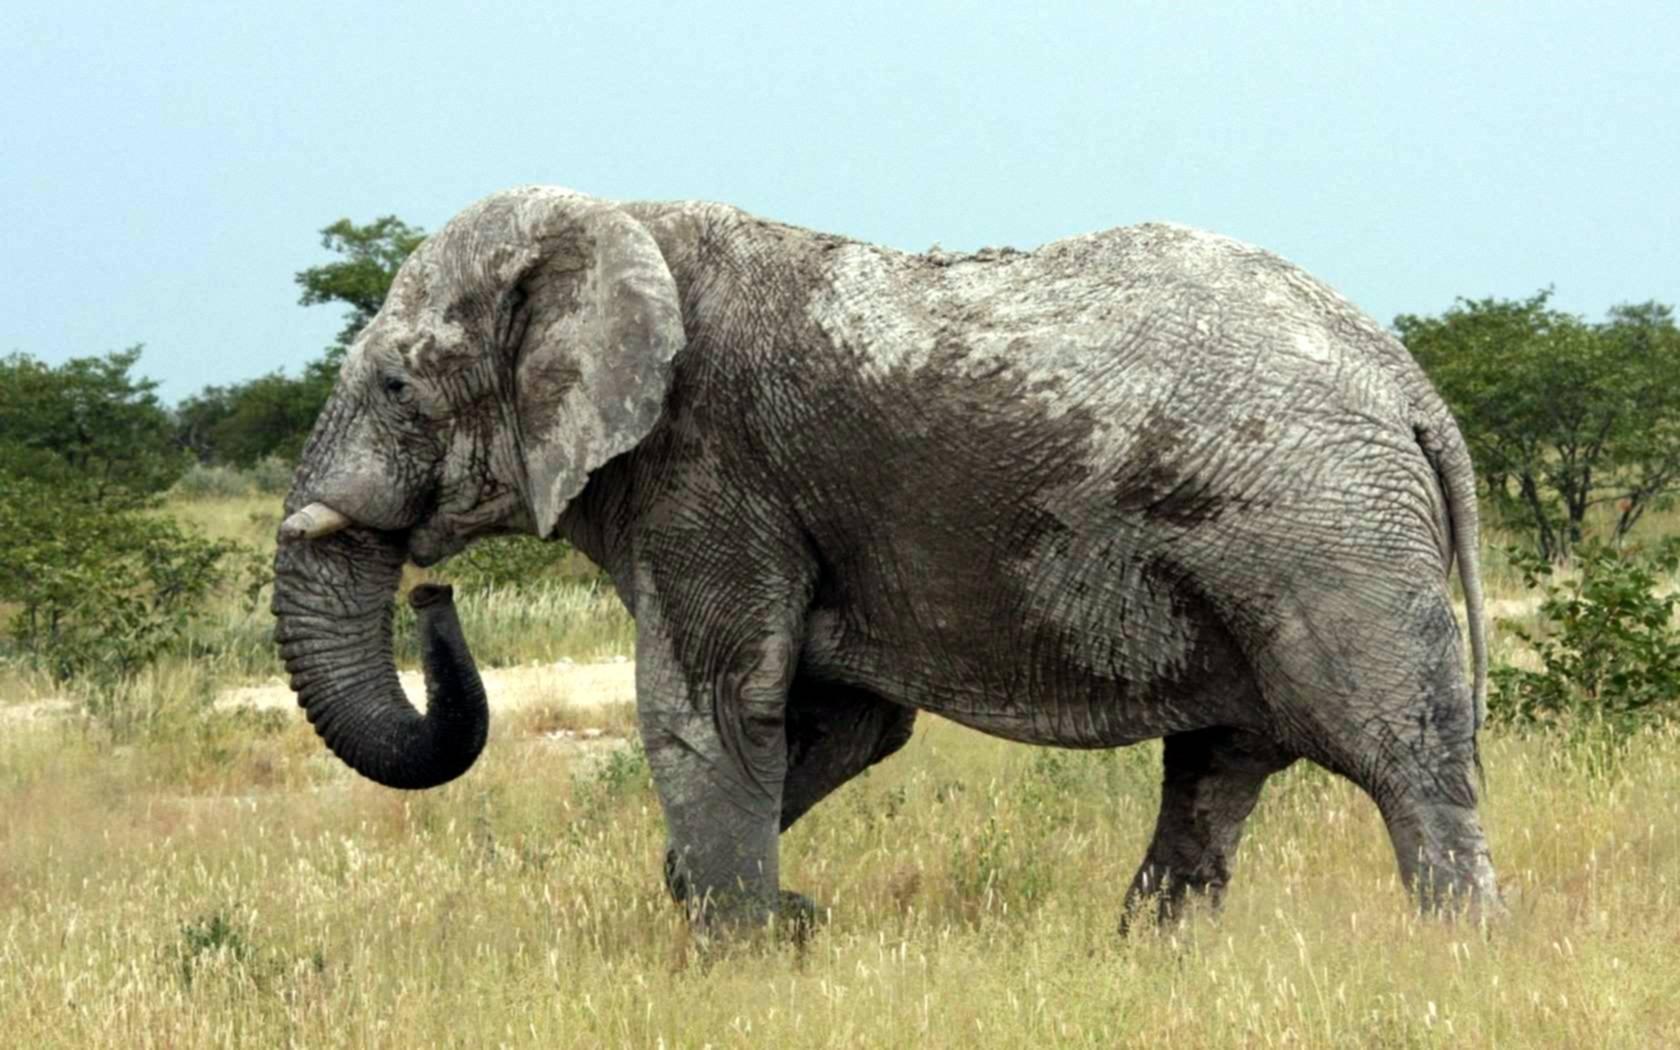 elefanten bilder kostenlos. Black Bedroom Furniture Sets. Home Design Ideas